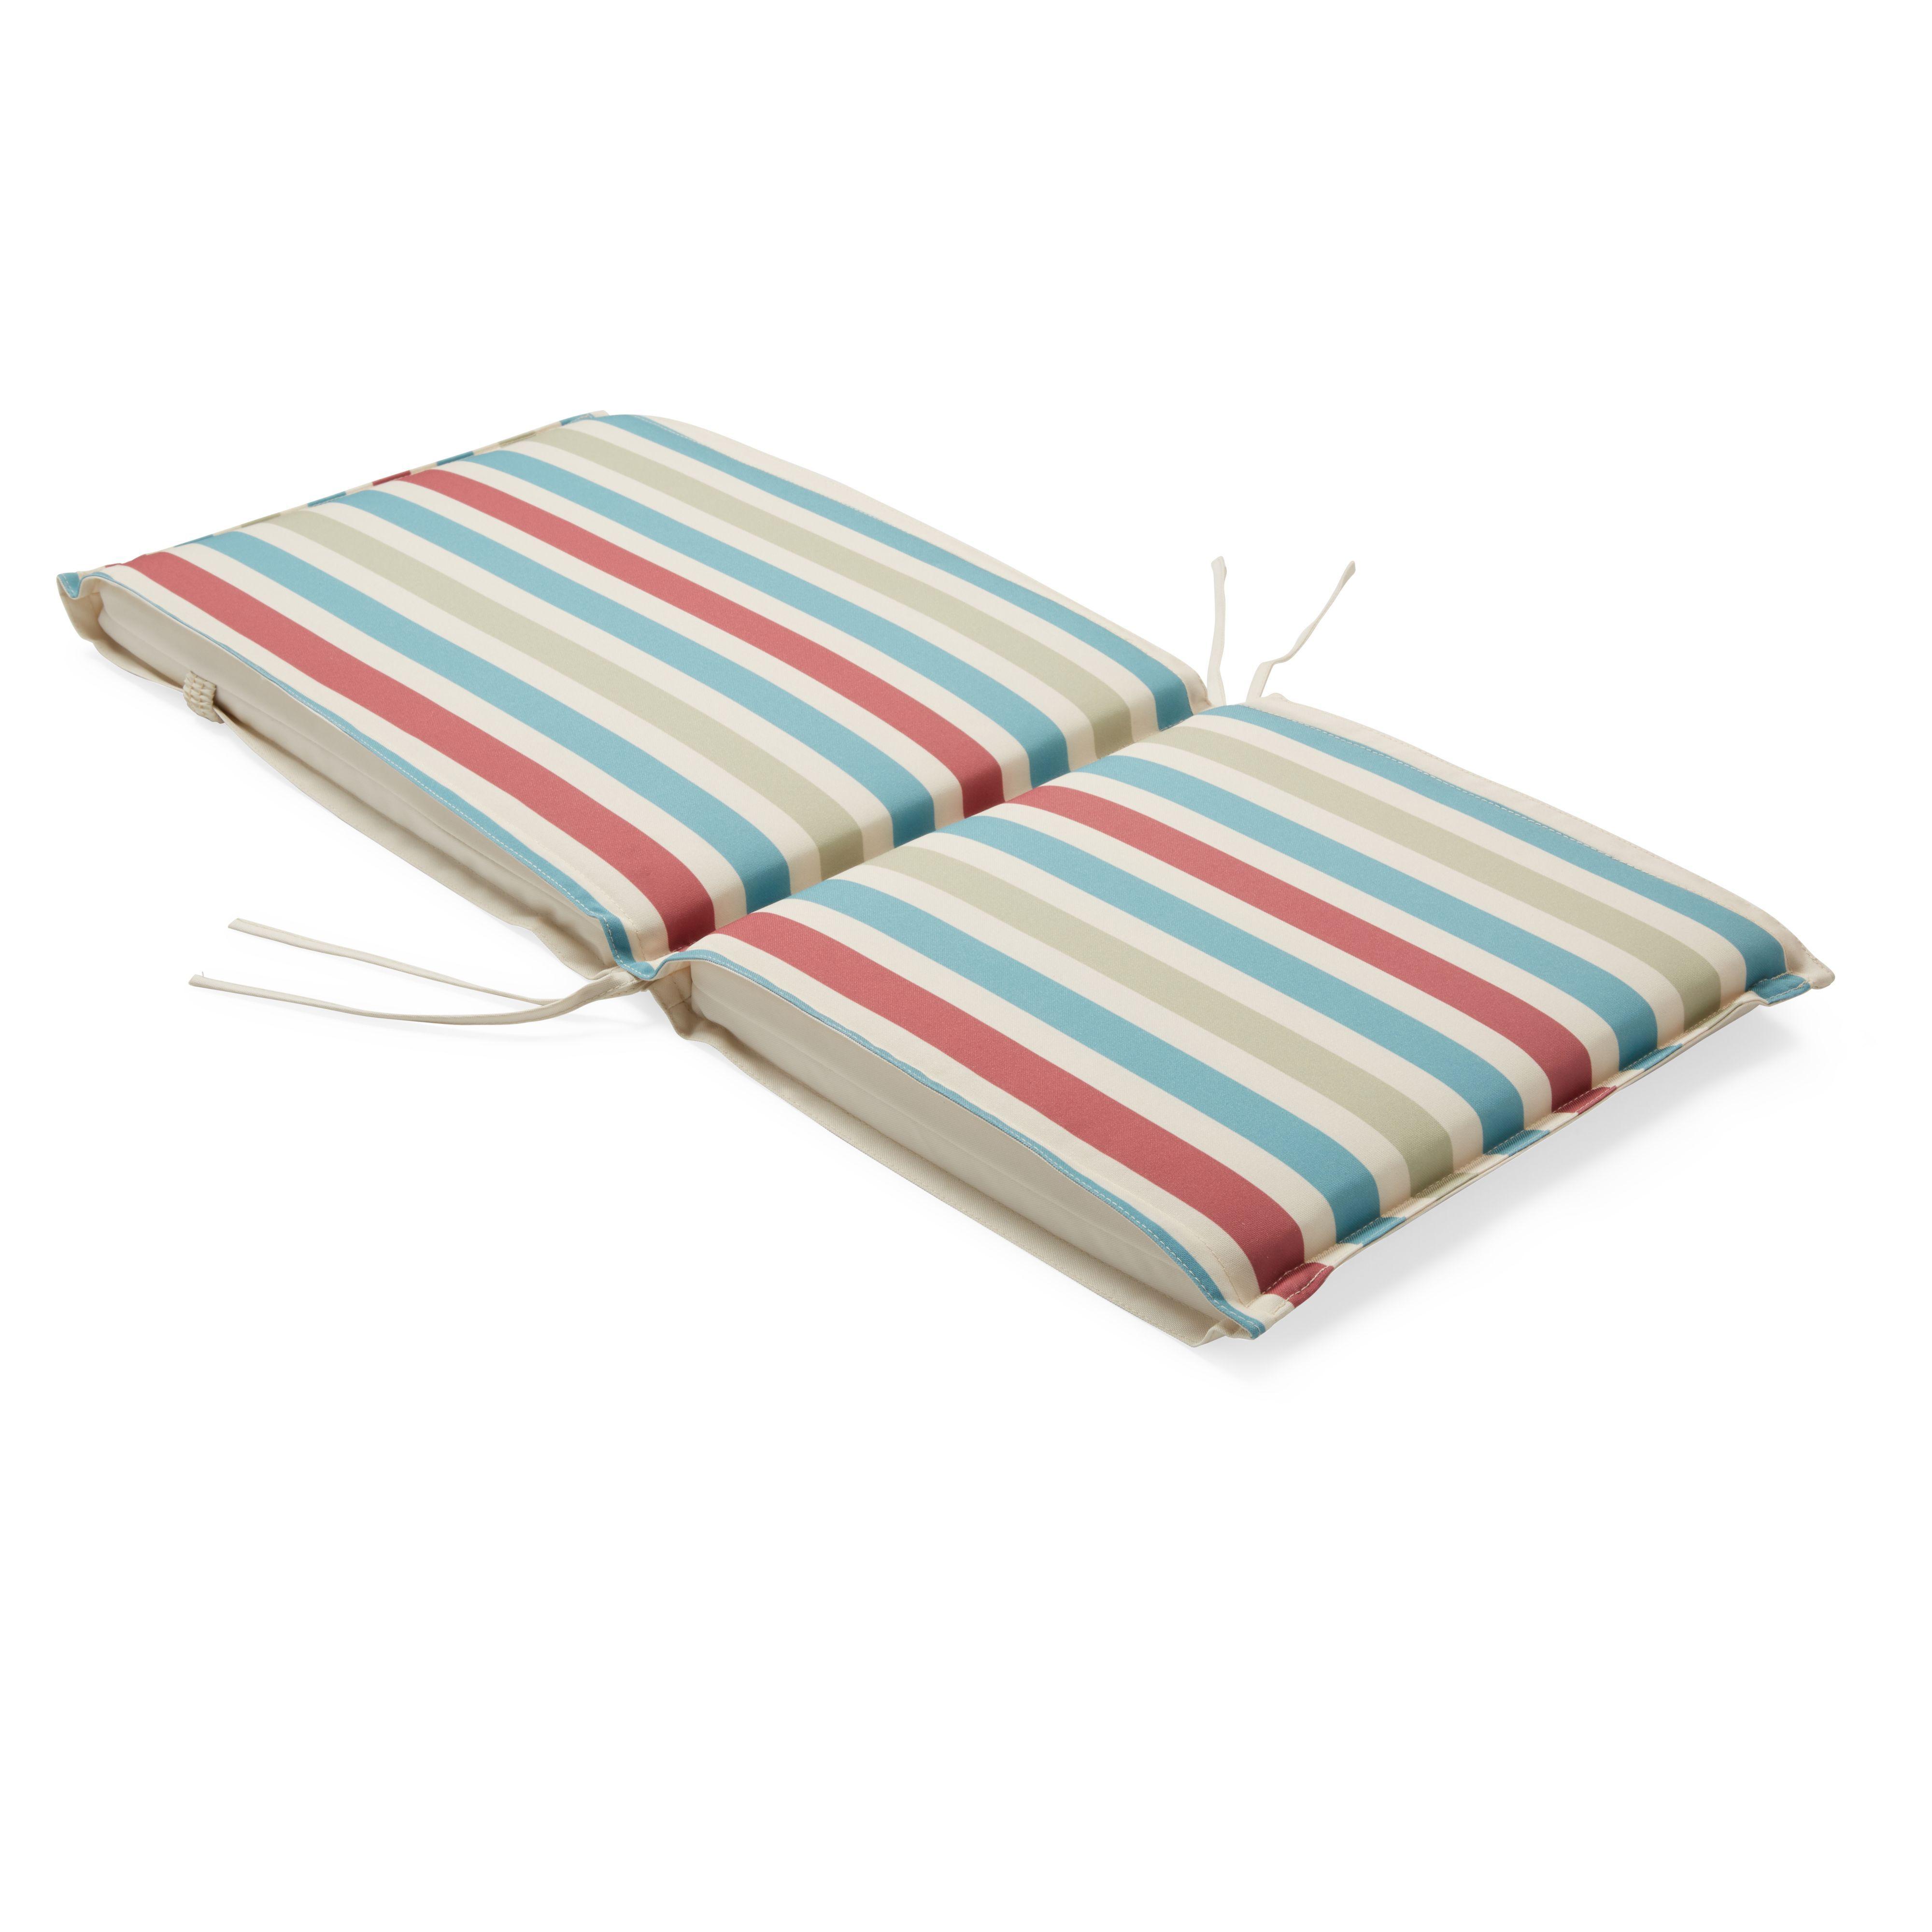 Isla Striped Multicolour Cushion. Outdoor Seat Cushion   DIY